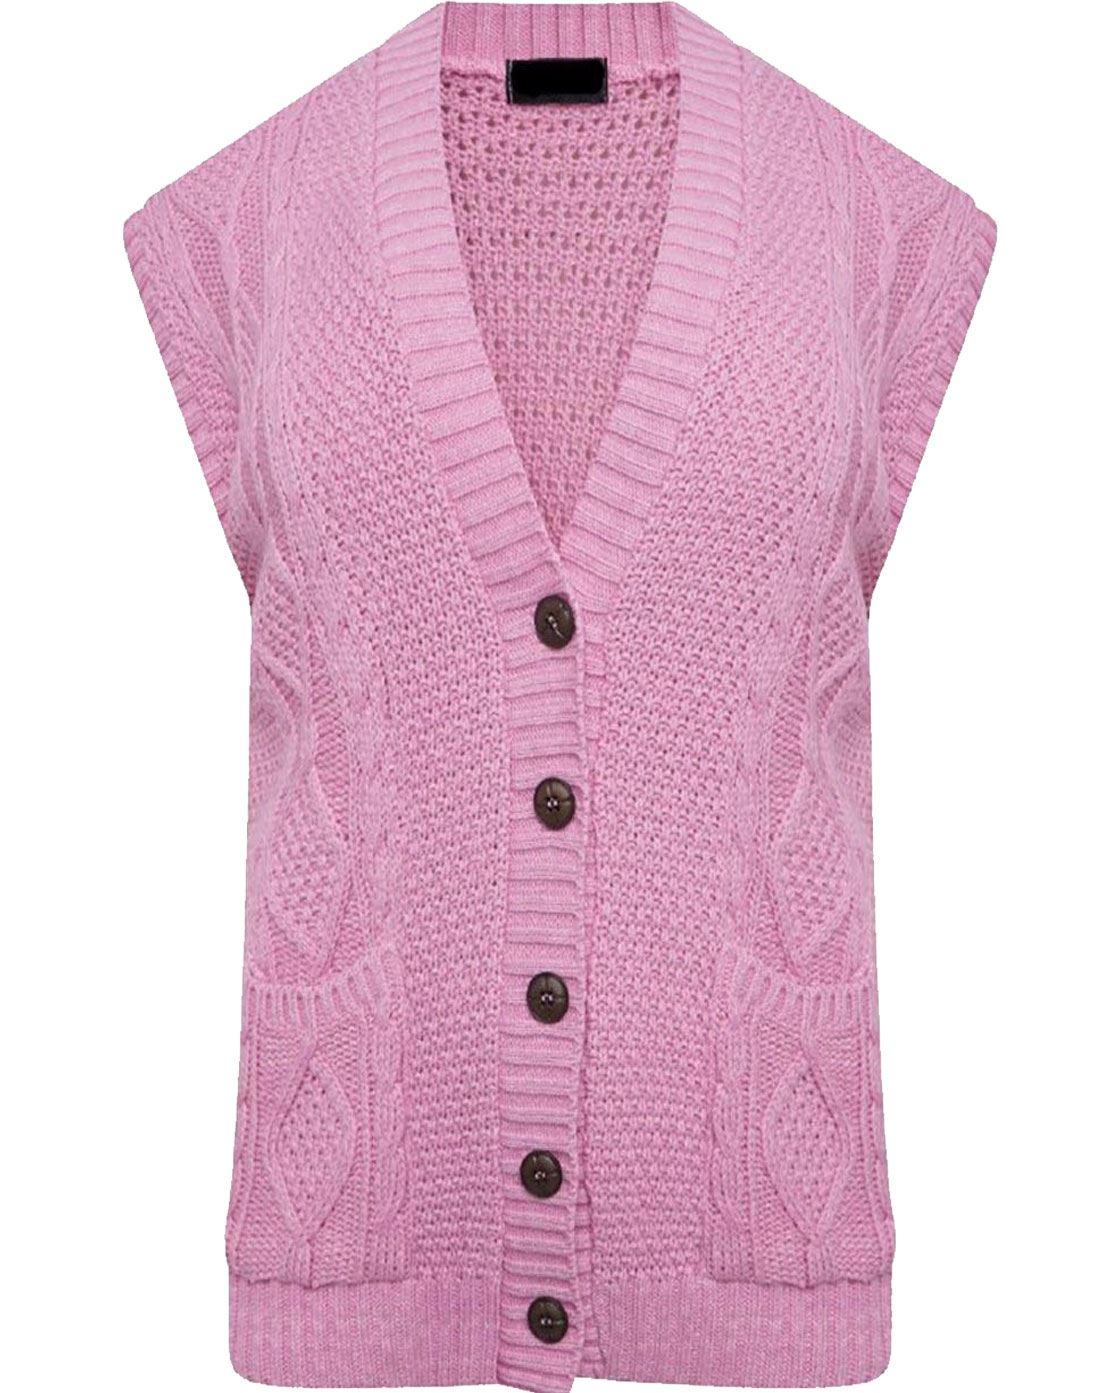 23649f7eb2b880 Women Sleeveless Button Cable Knitted Grandad Cardigan Ladies Winter ...